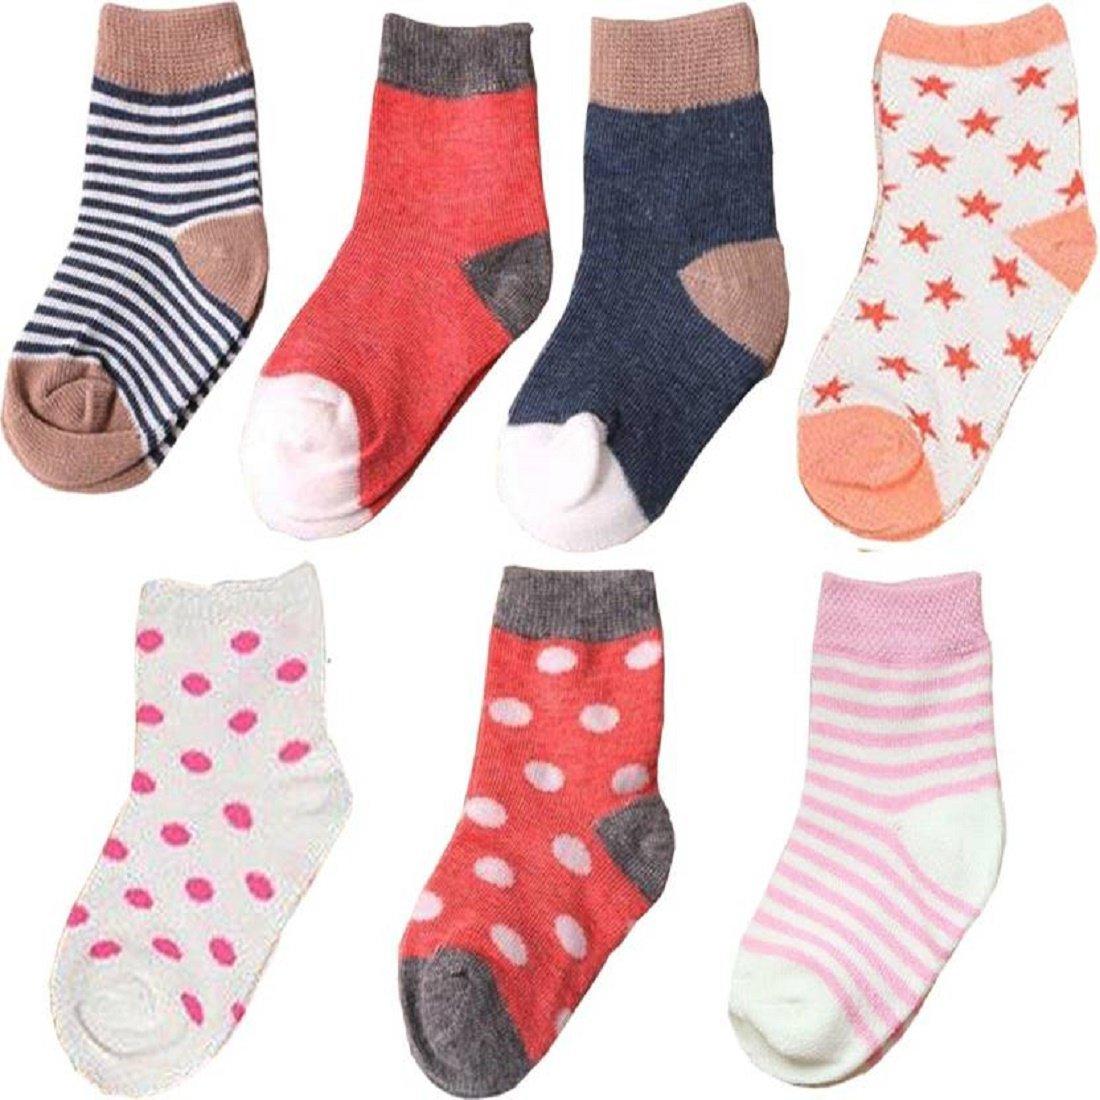 1fcbd7c01 Chinmay Kids 7 Days Baby Soft Cotton Socks (Set of 1)  Amazon.in  Baby